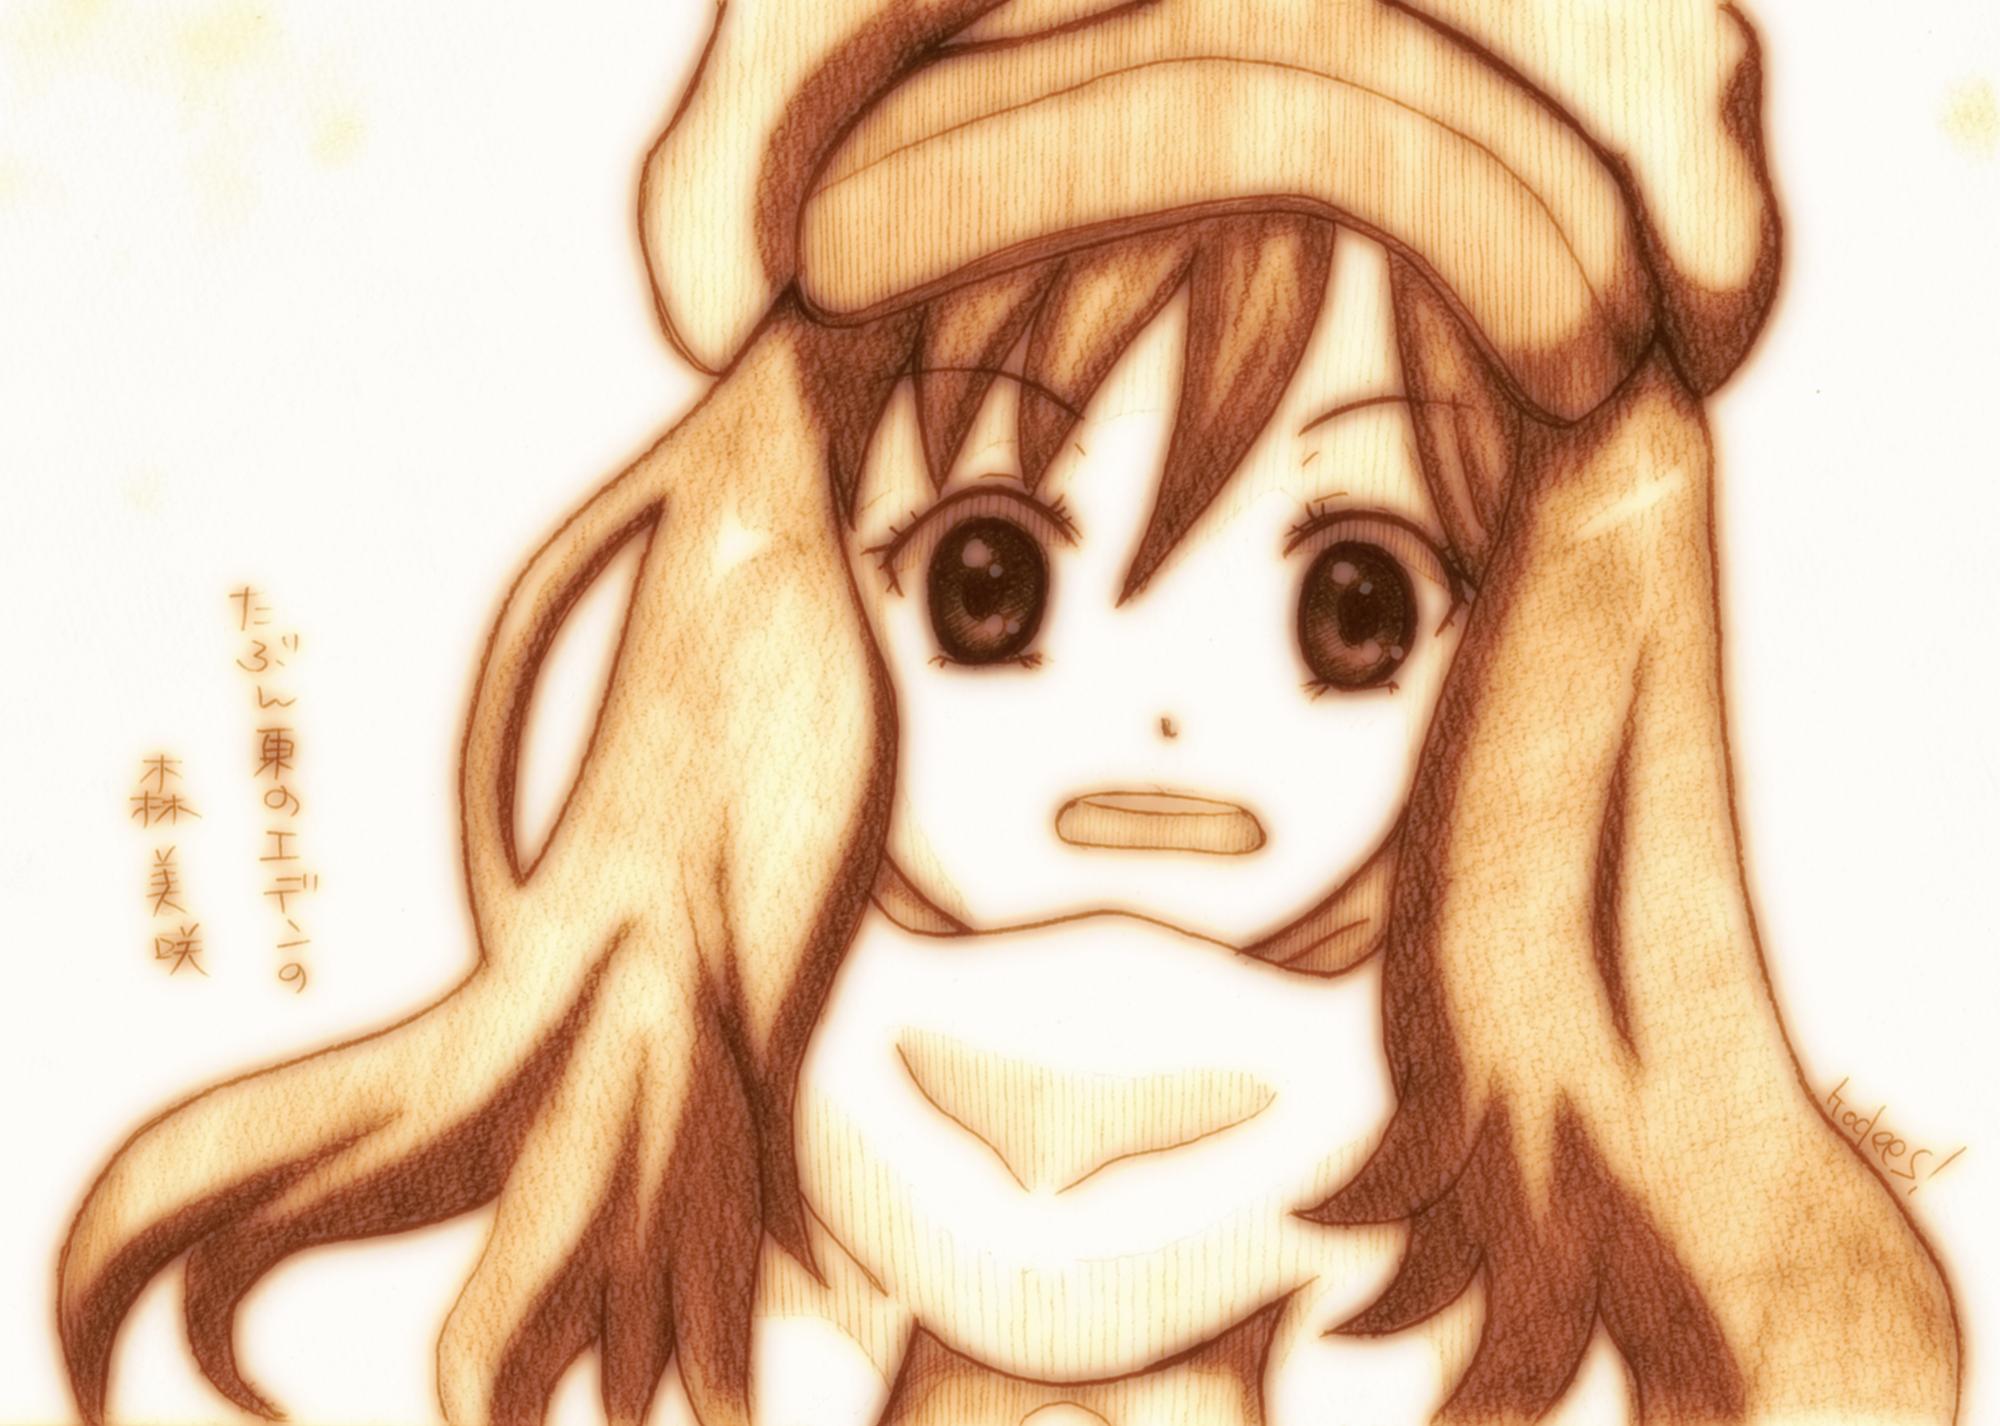 godees higashi_no_eden monochrome morimi_saki